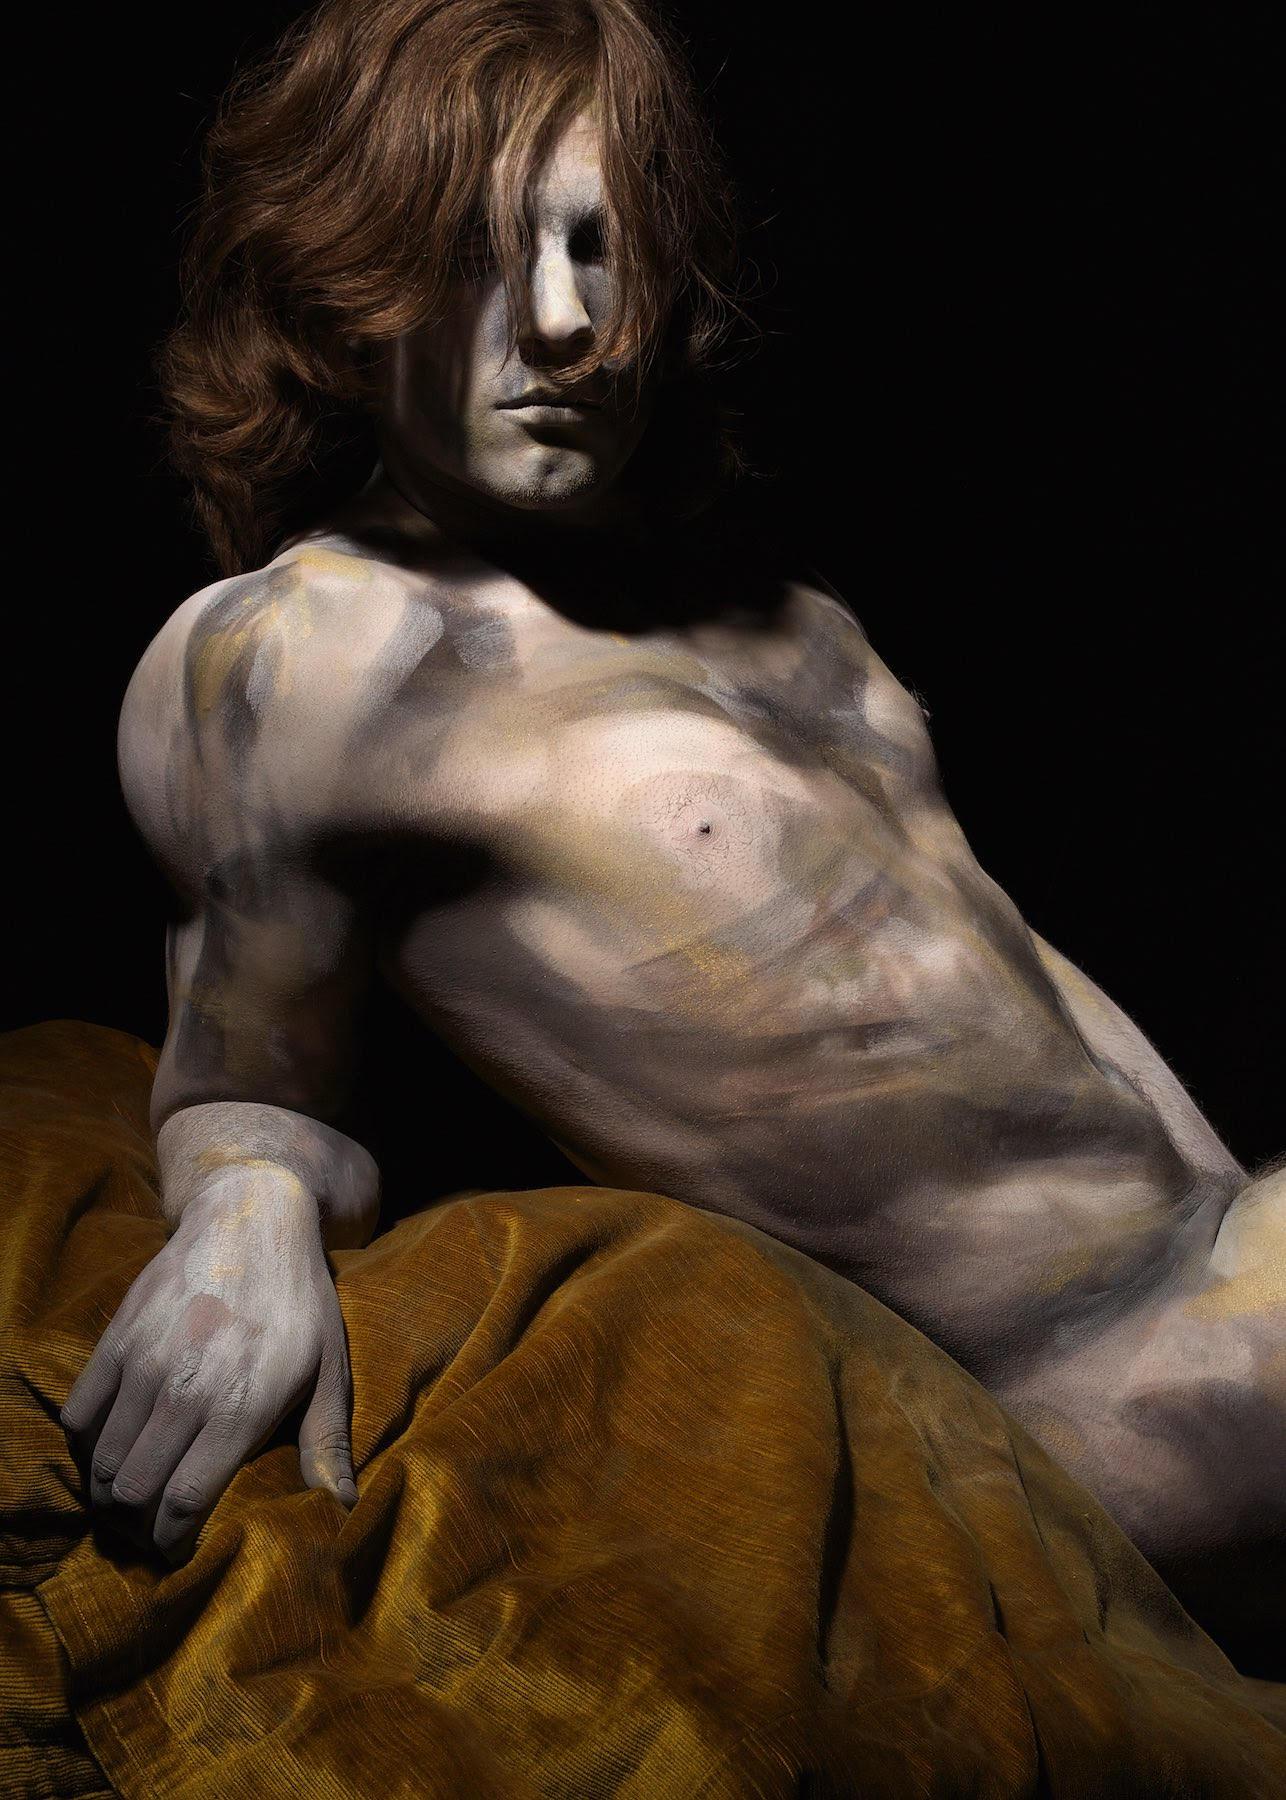 Bodypaint no. 2 (2013) | 95 x 68 cm | inkjet op hahnemuhle photo silk baryta papier, bevestigd op dibond 2 mm in houten lijst (donkerbruin) | Oplage 5 | Koen Hauser | Galerie Untitled | Beschikbaar